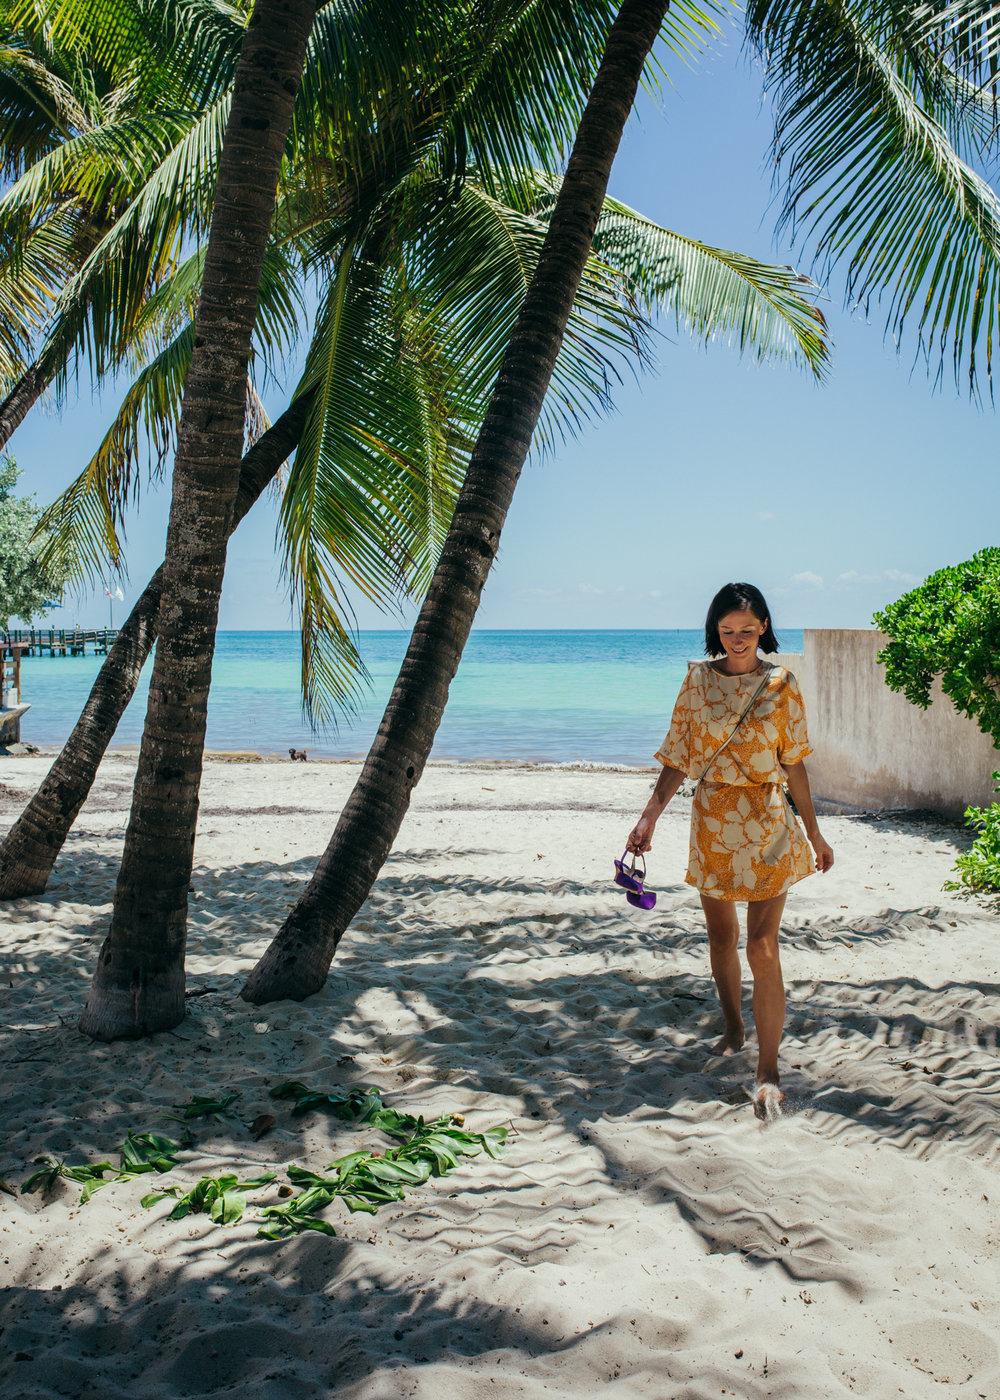 key west dog beach, visit florida, key west photographer, lena perkins, louies restaurant, bicycle, casa marina, cayo hueso, island, tropics